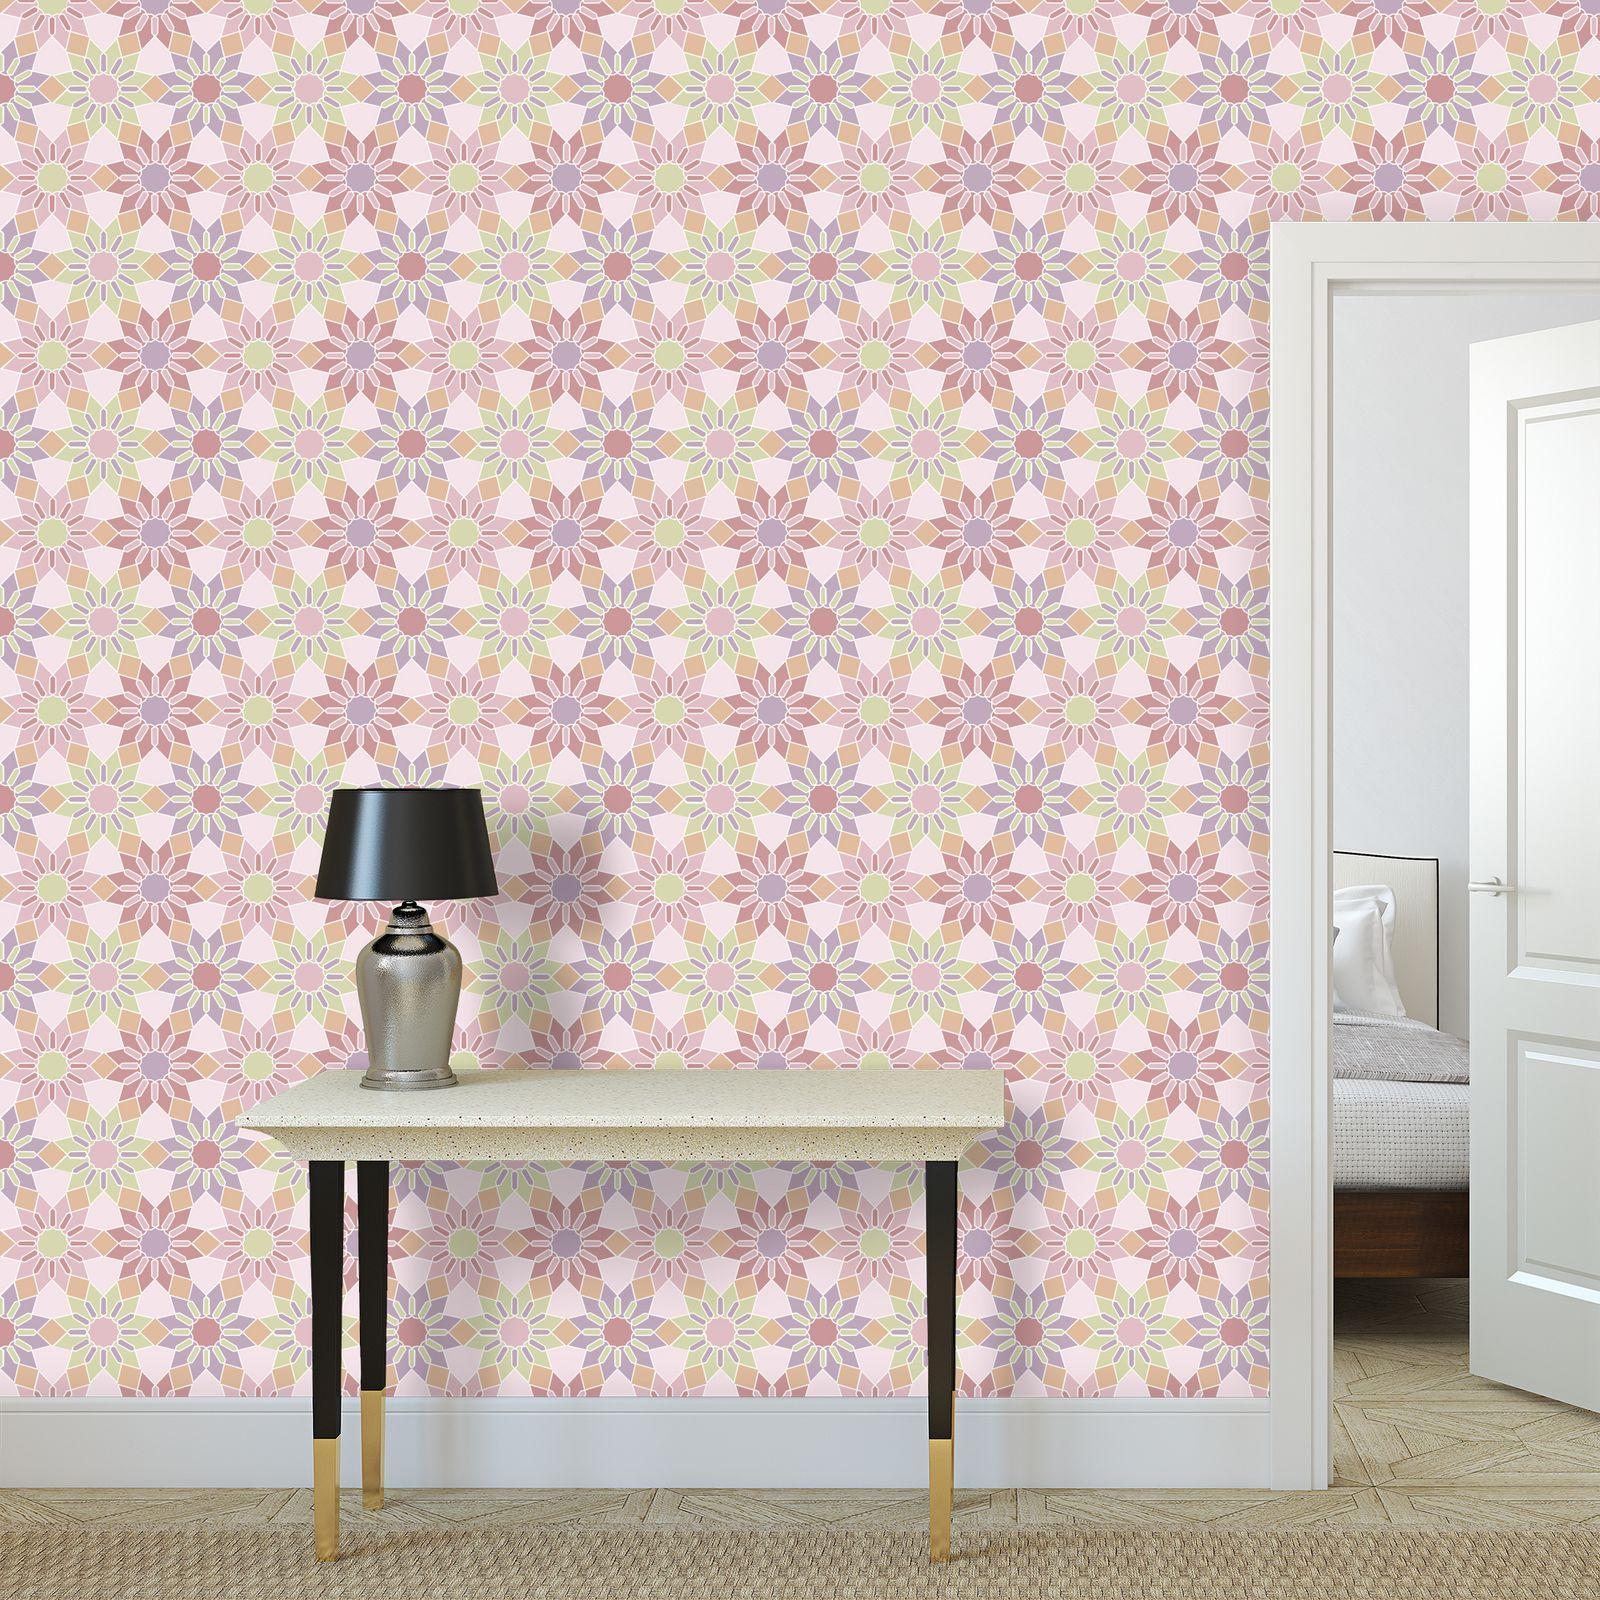 Wallpaper Rolls Floral